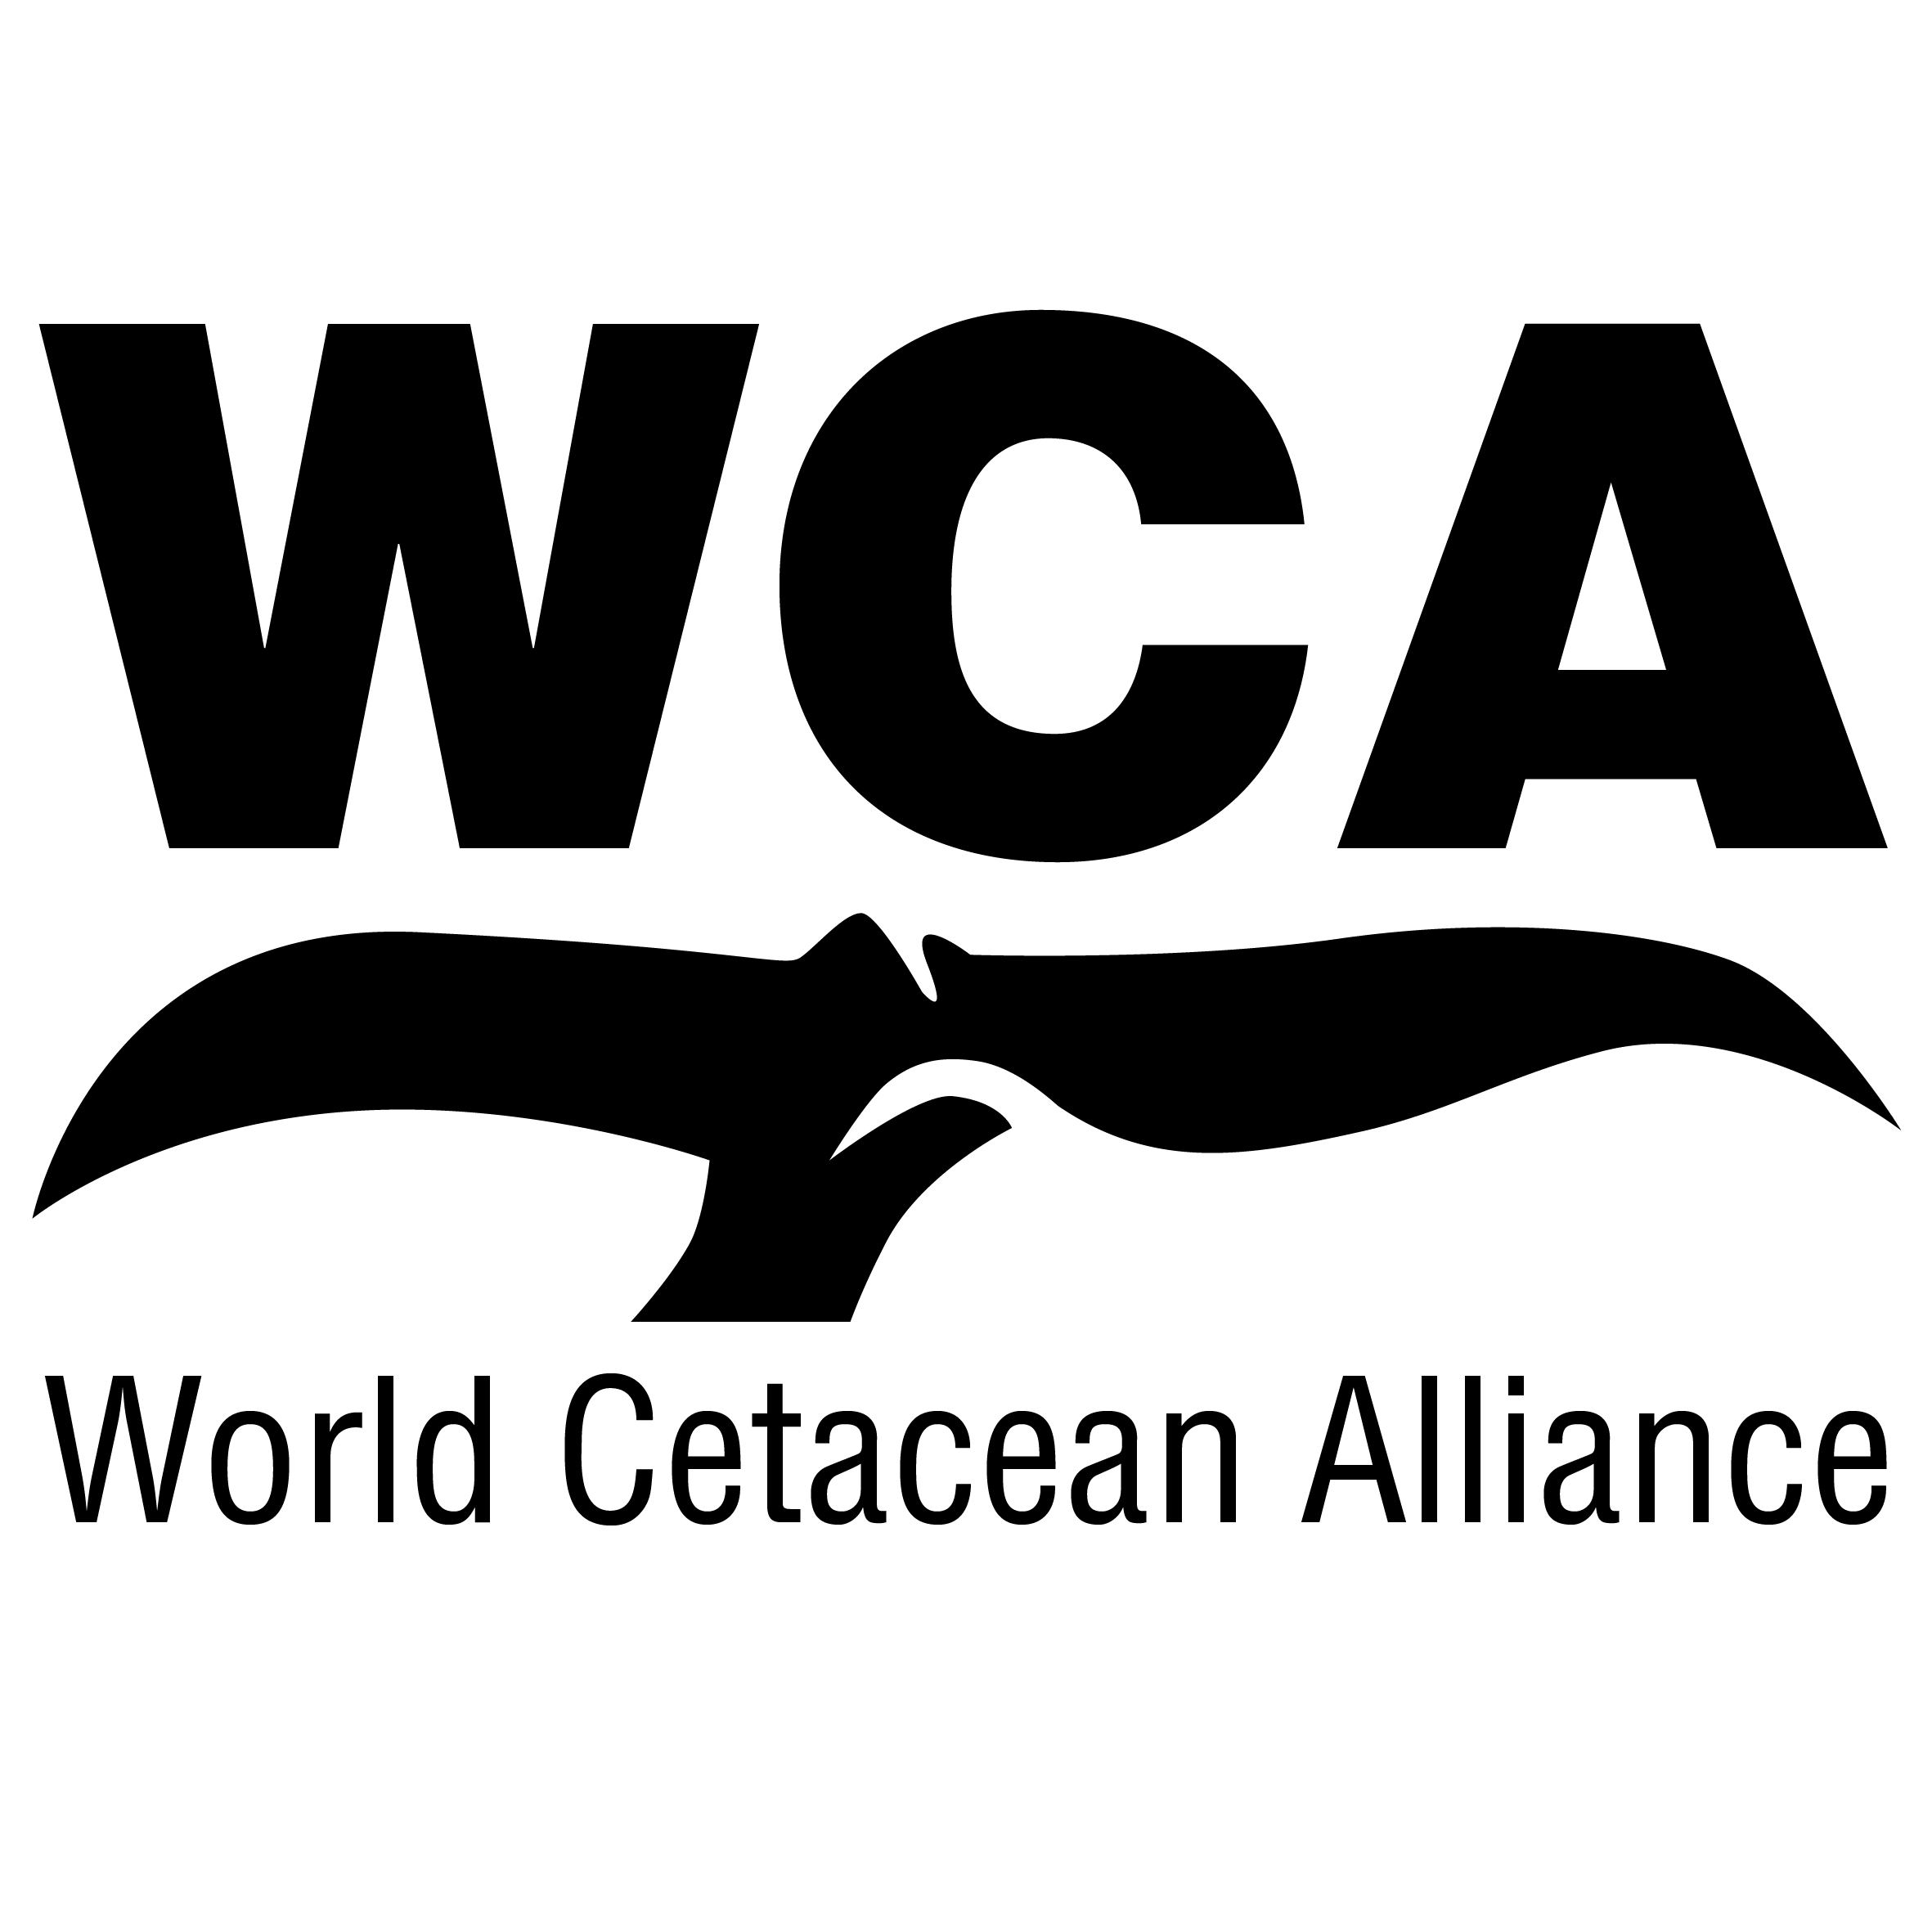 WCA black transparent